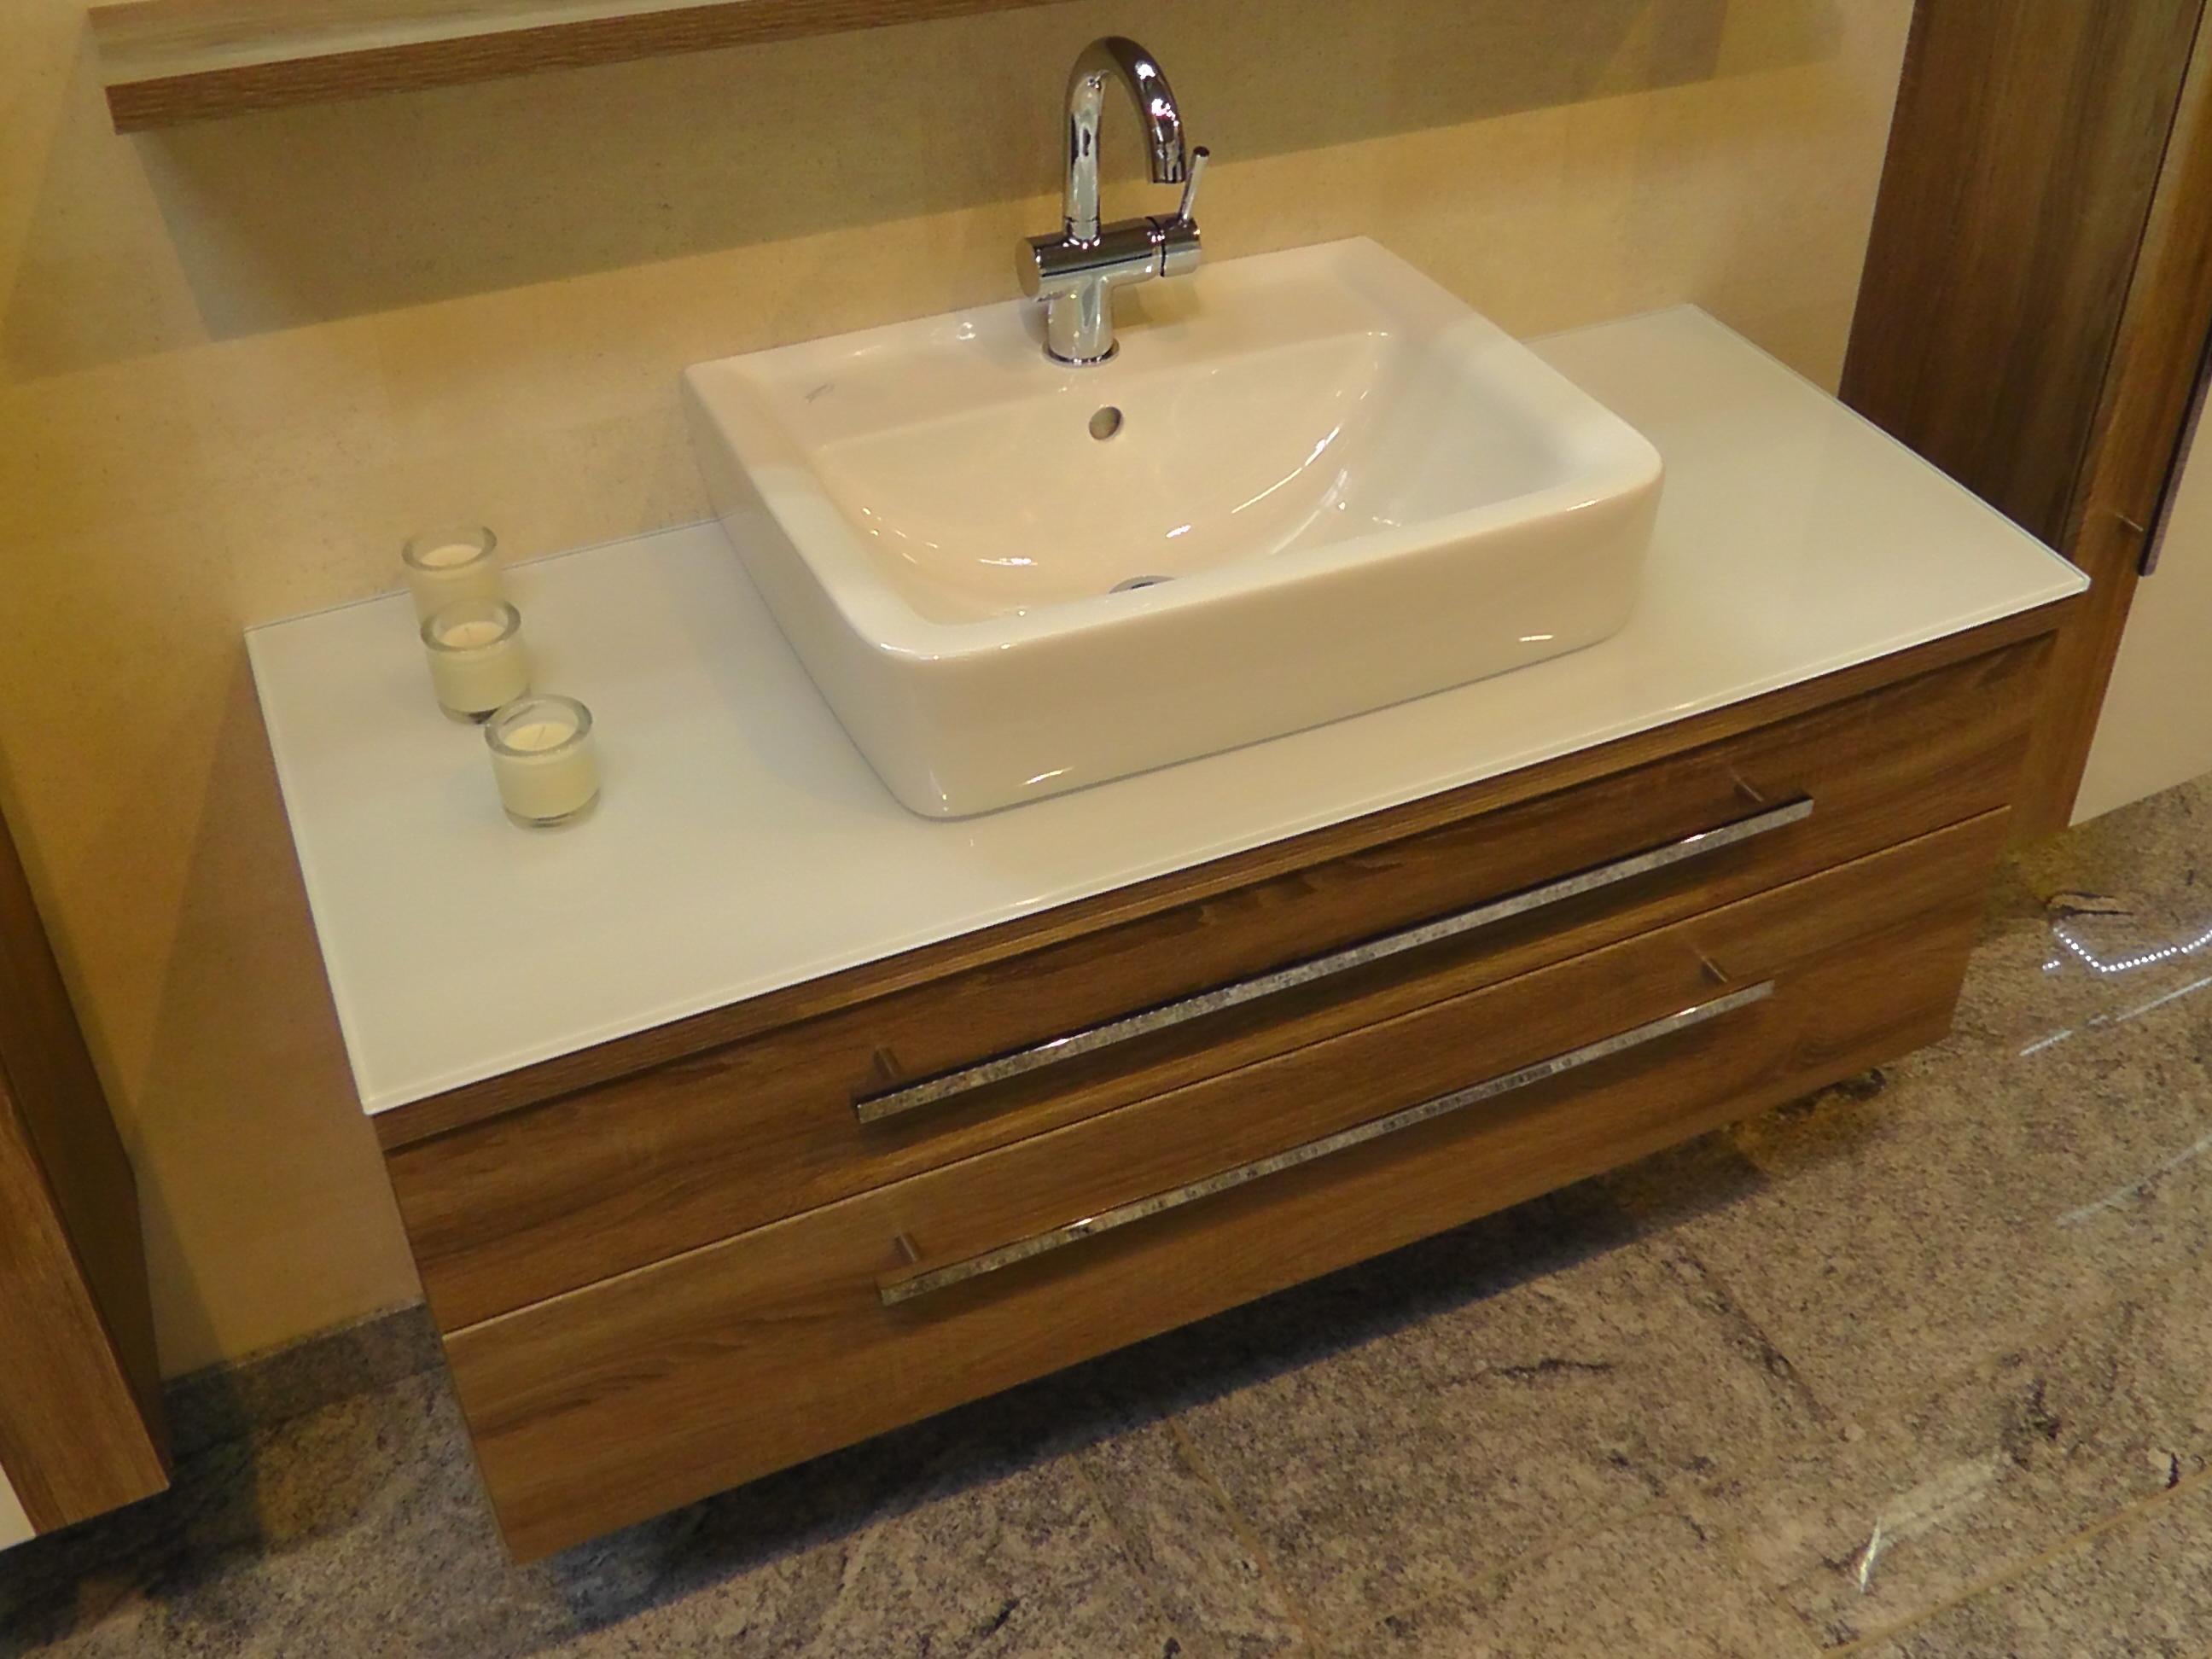 kera trends waschtisch set 75 cm renova nr 1 plan arcom. Black Bedroom Furniture Sets. Home Design Ideas